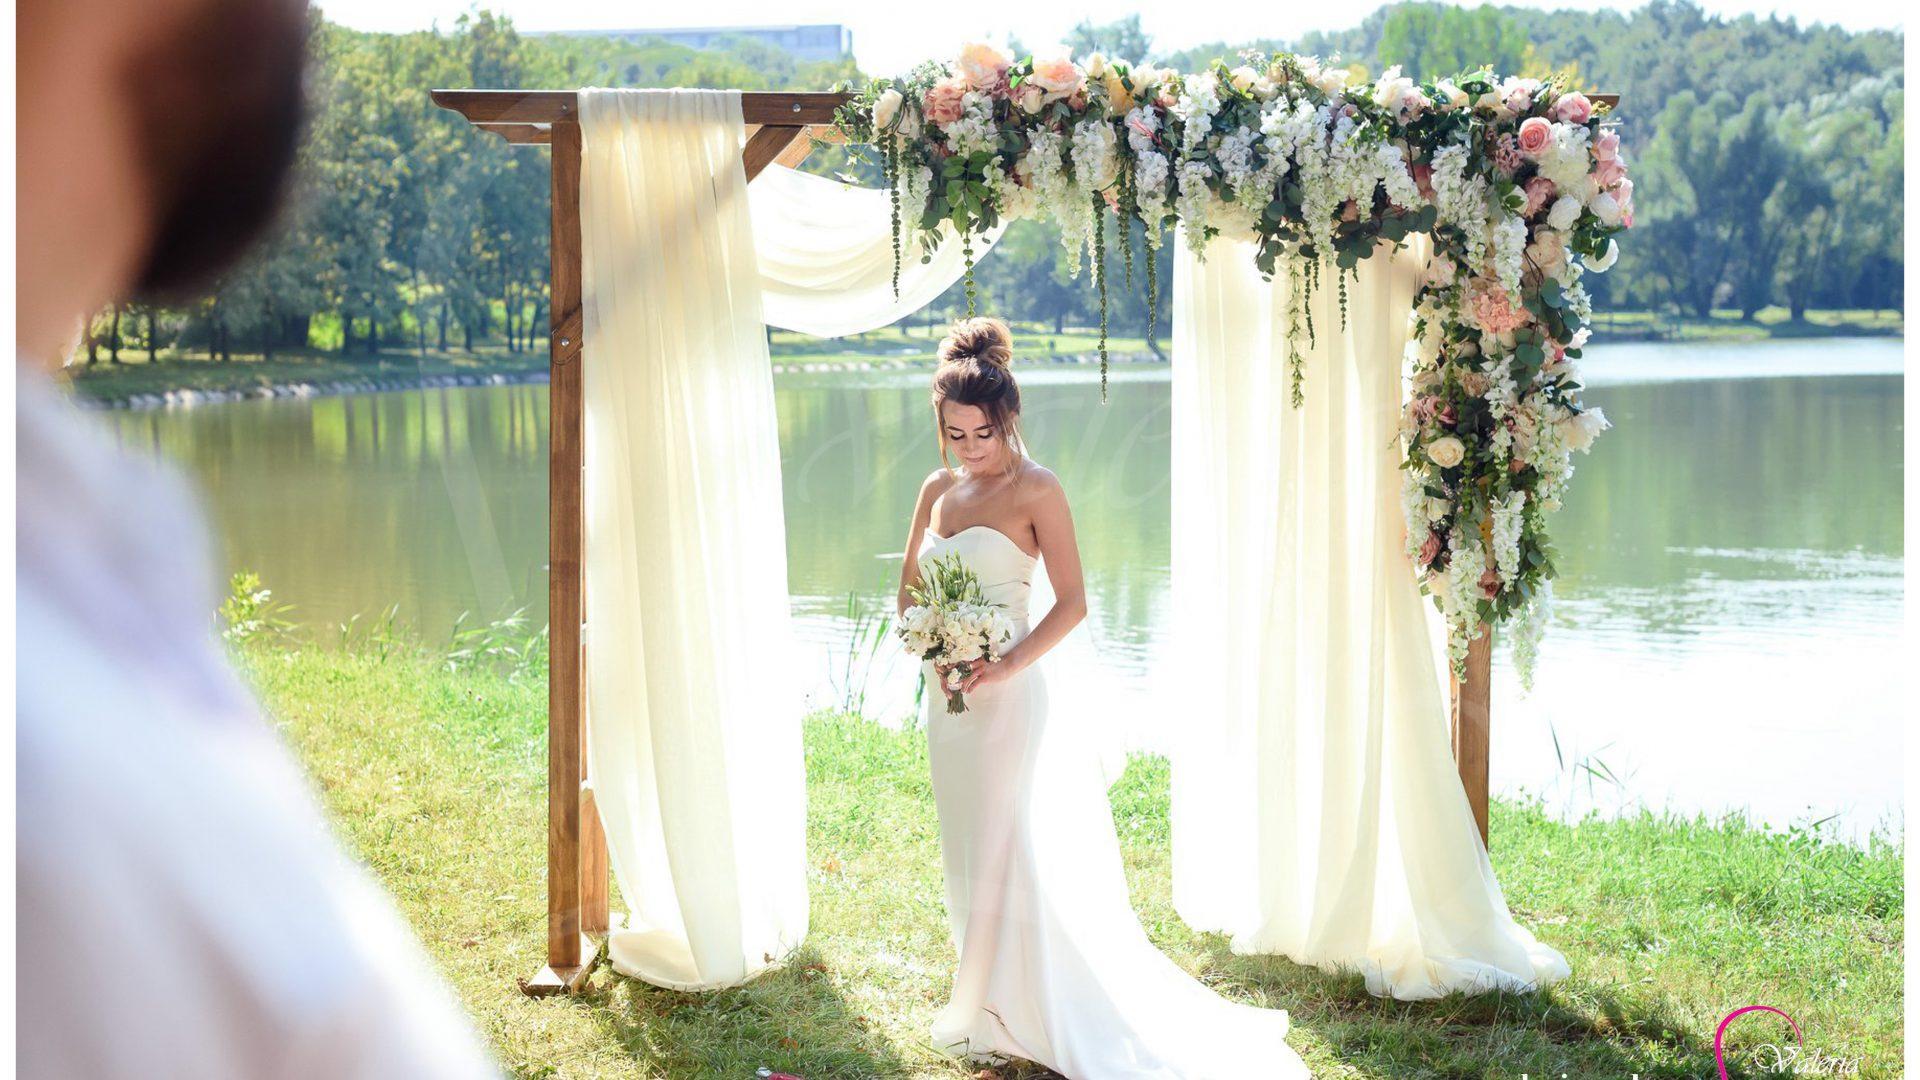 Inregistrarea casatoriei sub cerul liber Agentia Valeria Mariage 069787665 www.valeria (7)